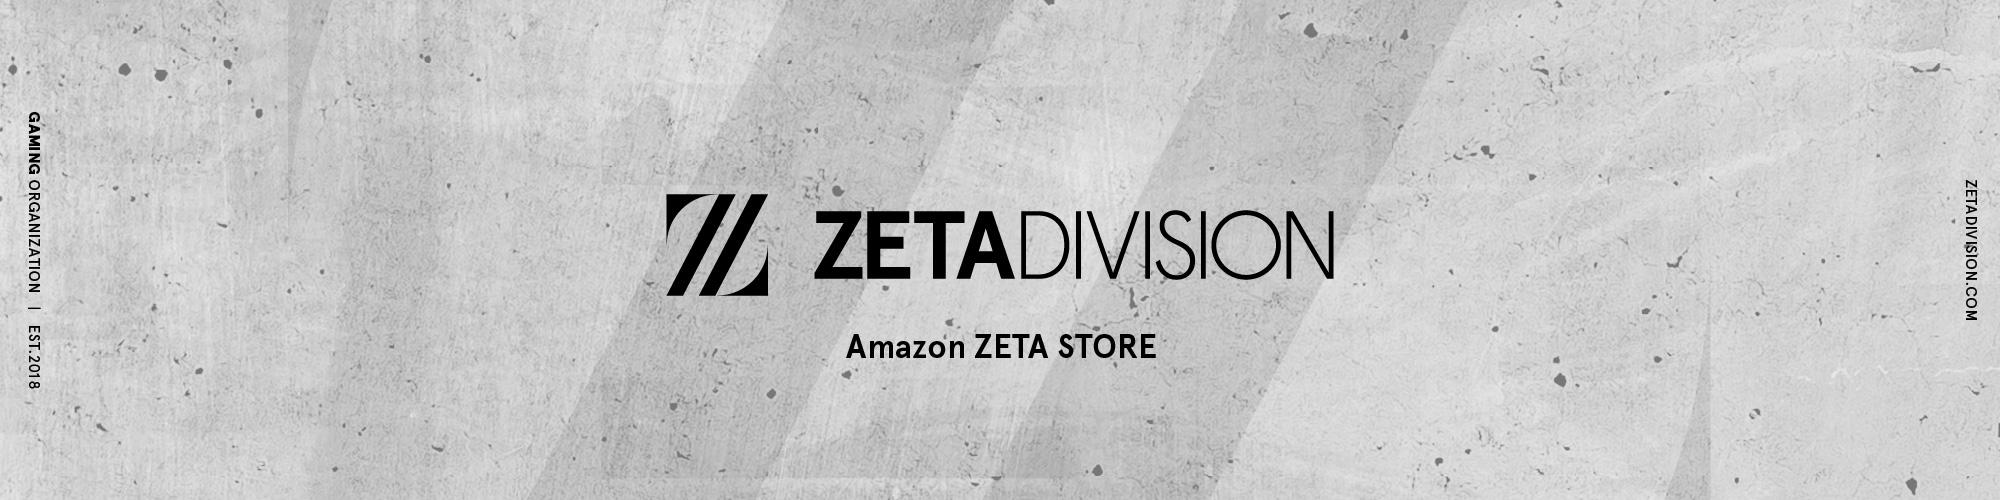 ZETA DIVISIONキャンペーン